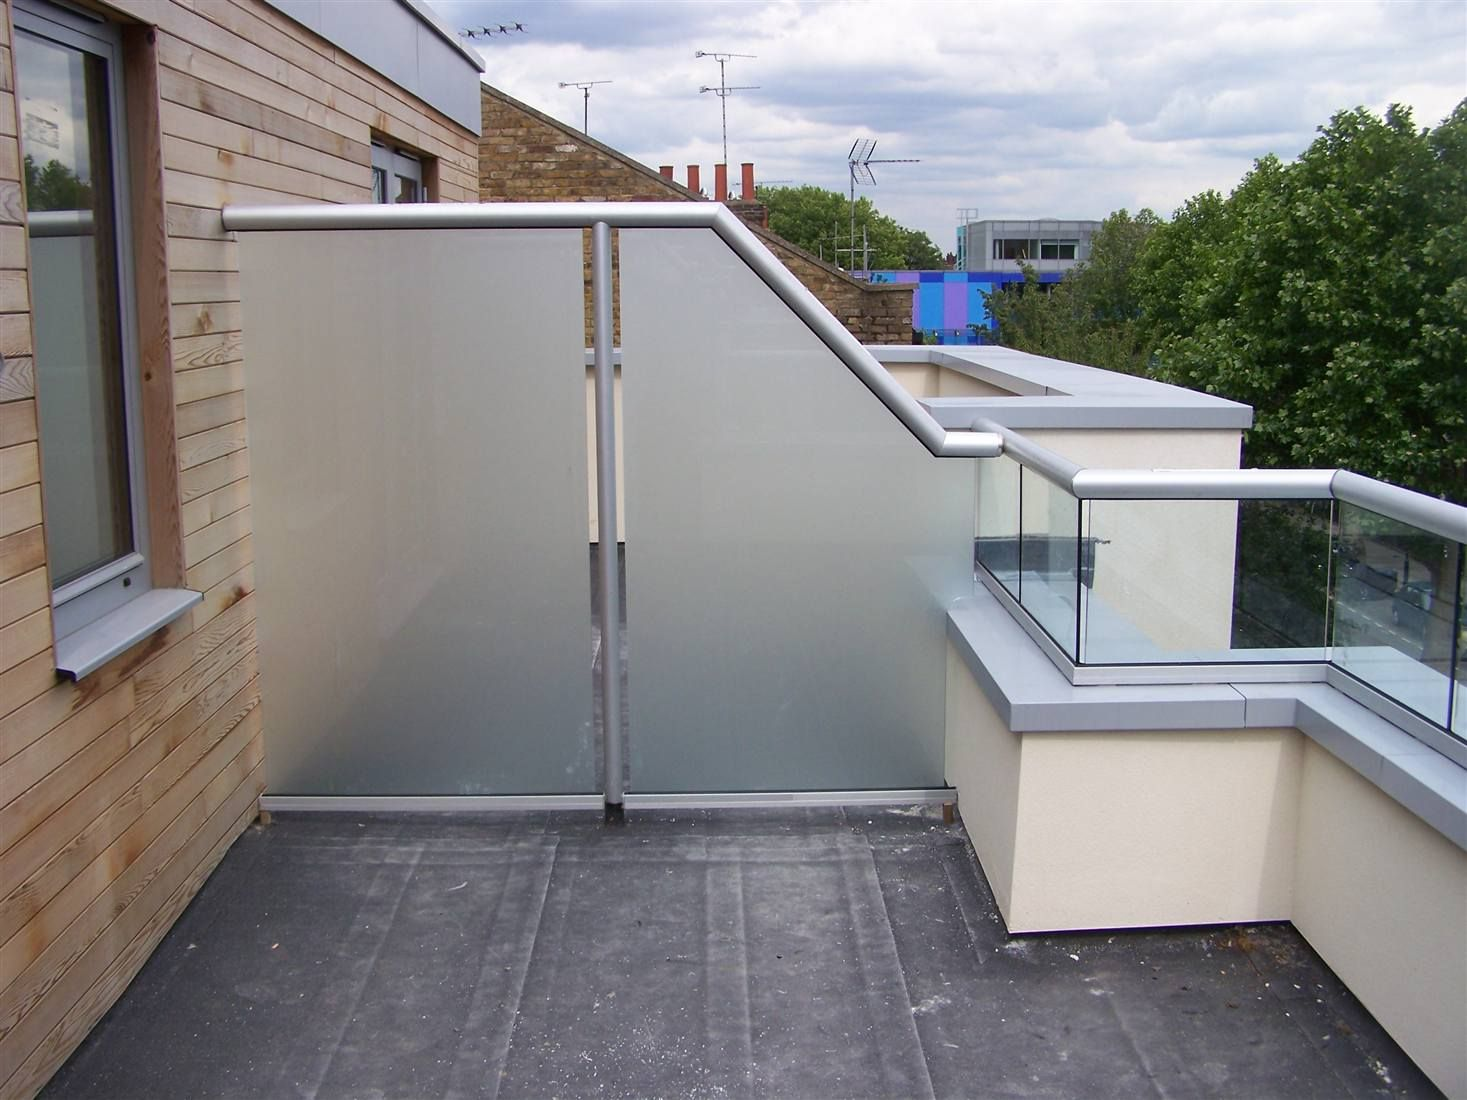 Barade Privacy Screen Satinised Balcony privacy, Privacy